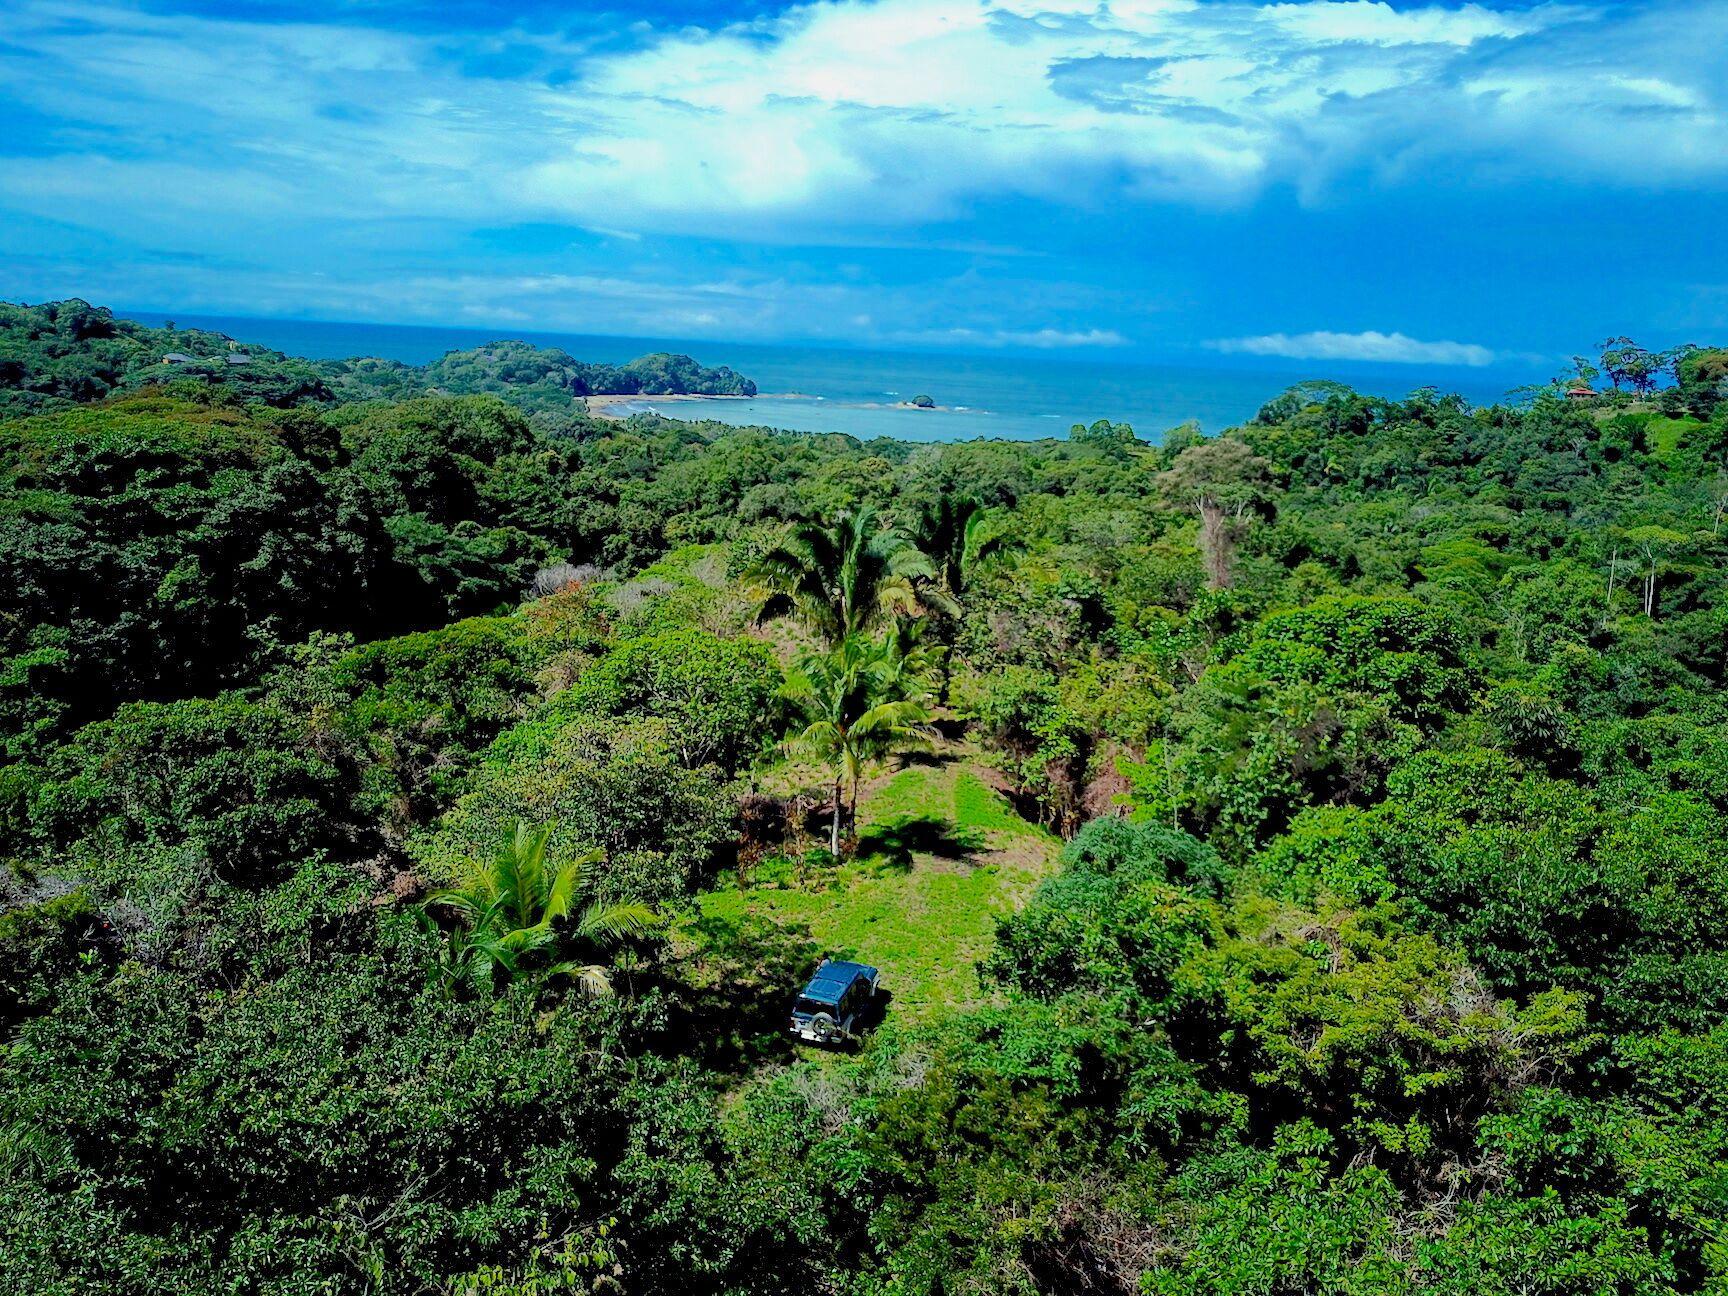 Dominical-Costa-Rica-property-costaricarealestateDOM335-5.jpeg